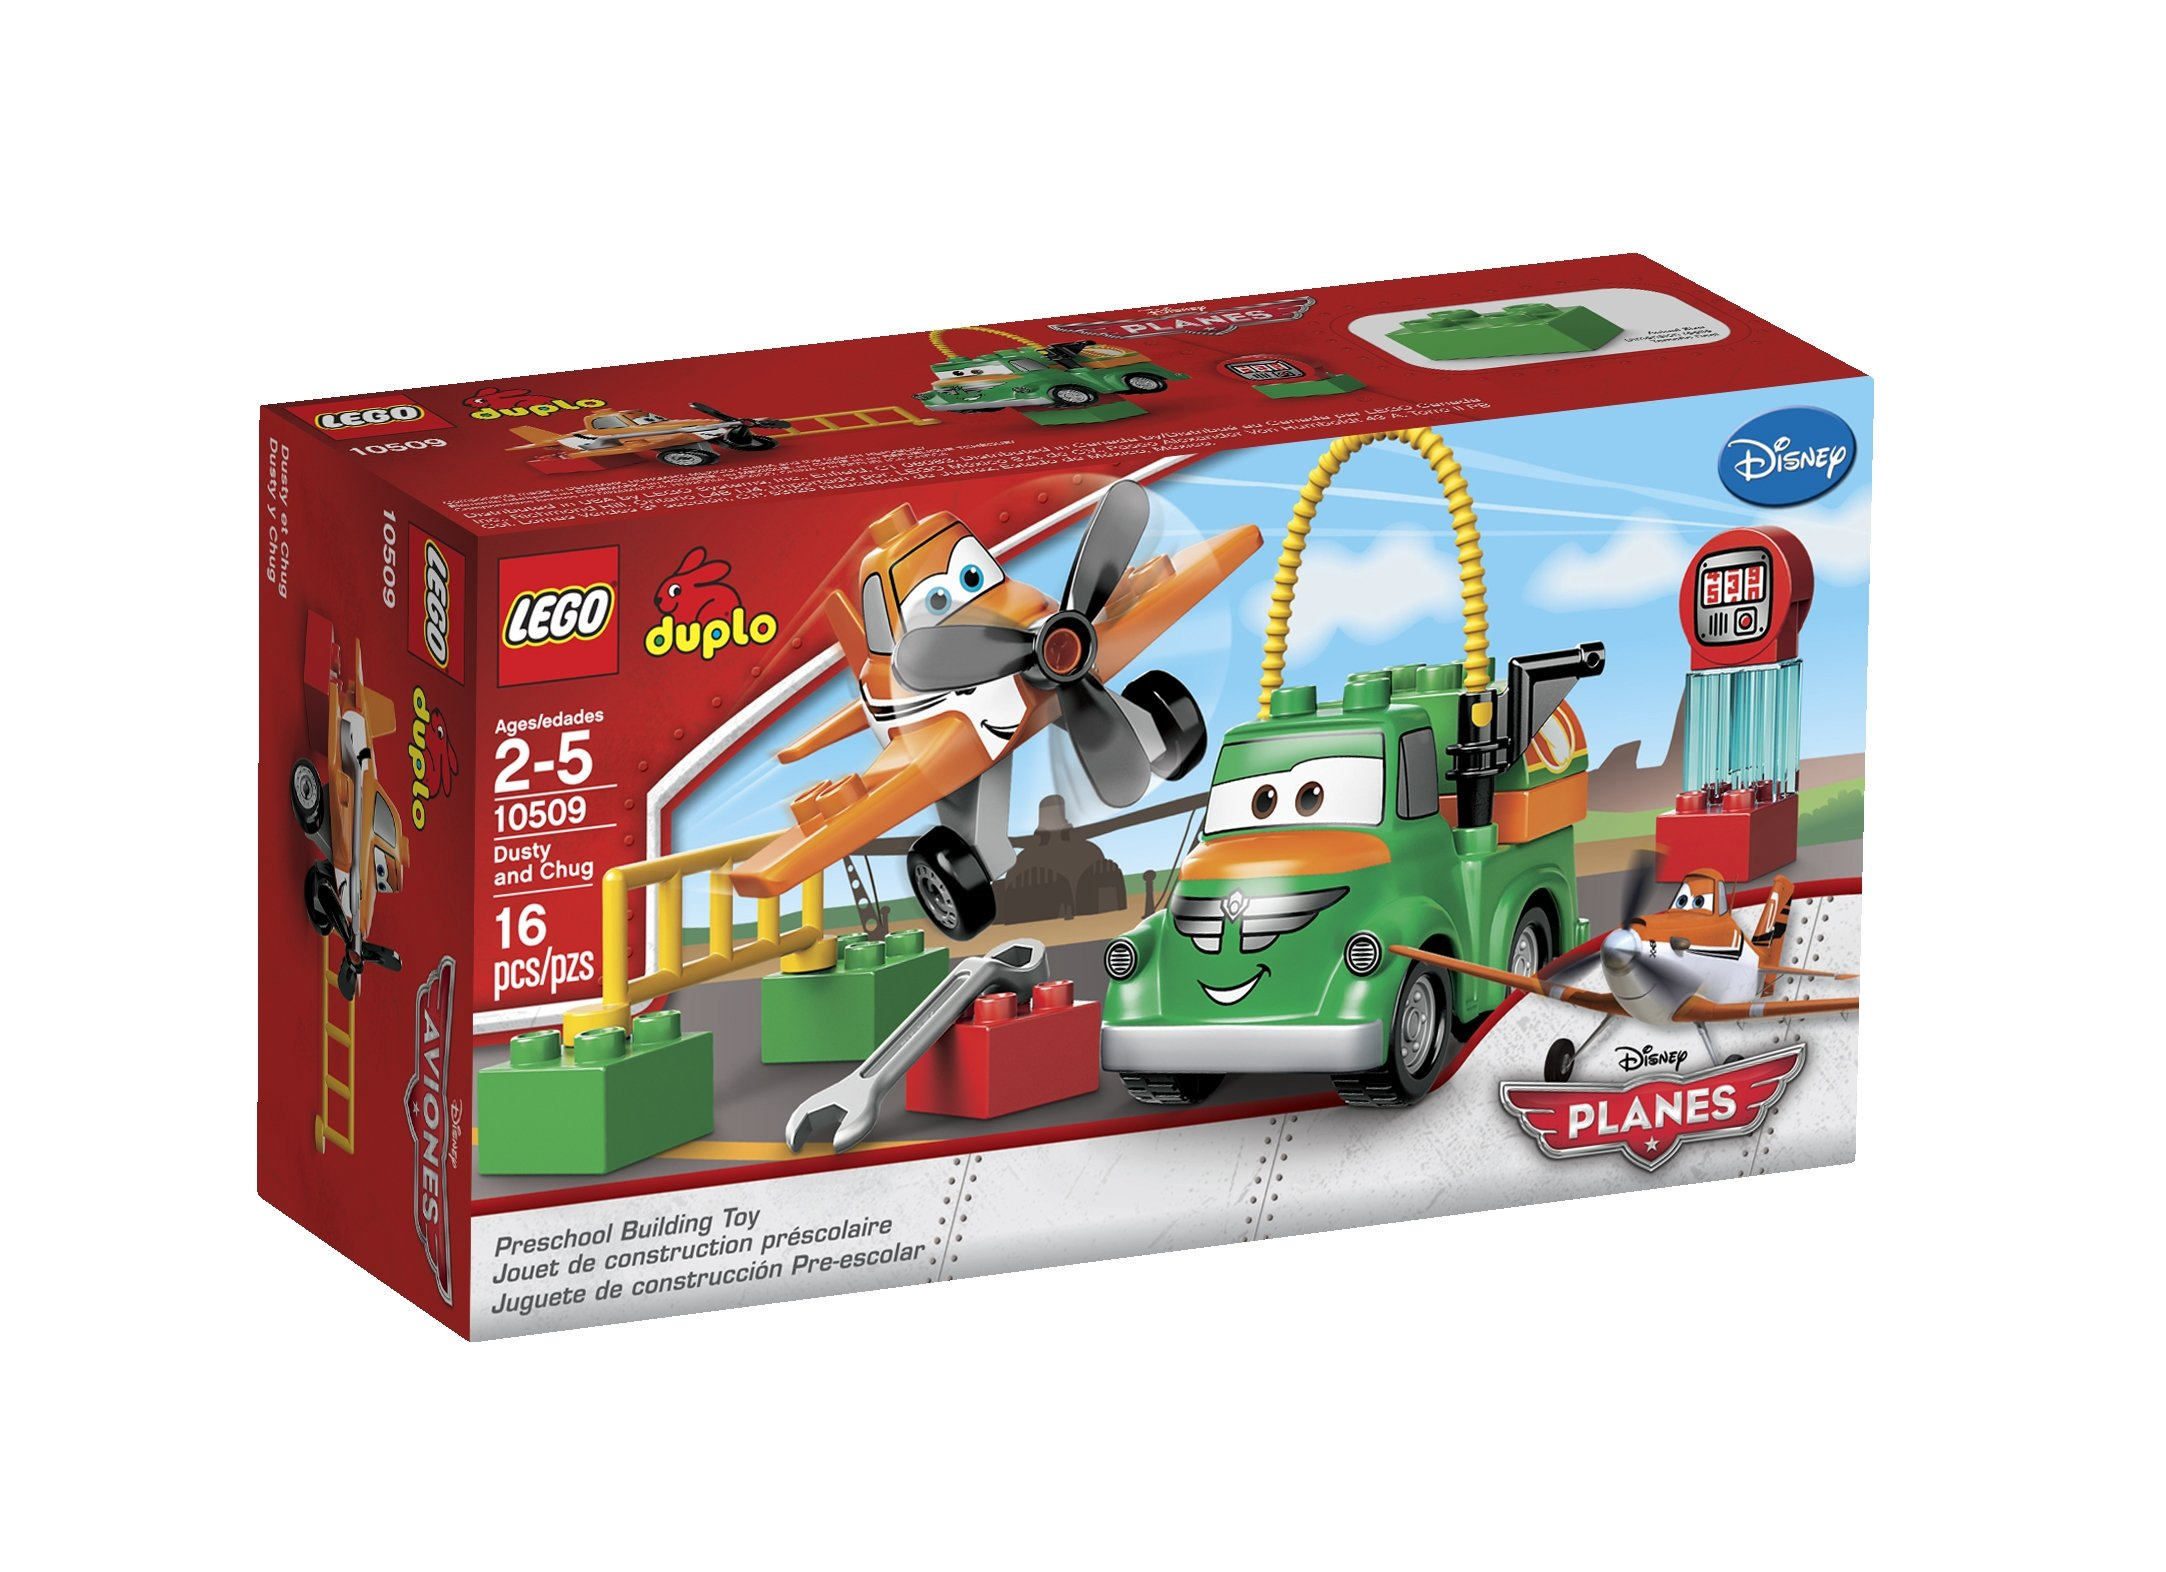 Planes Lego Duplo Item Fuel Truck Chug